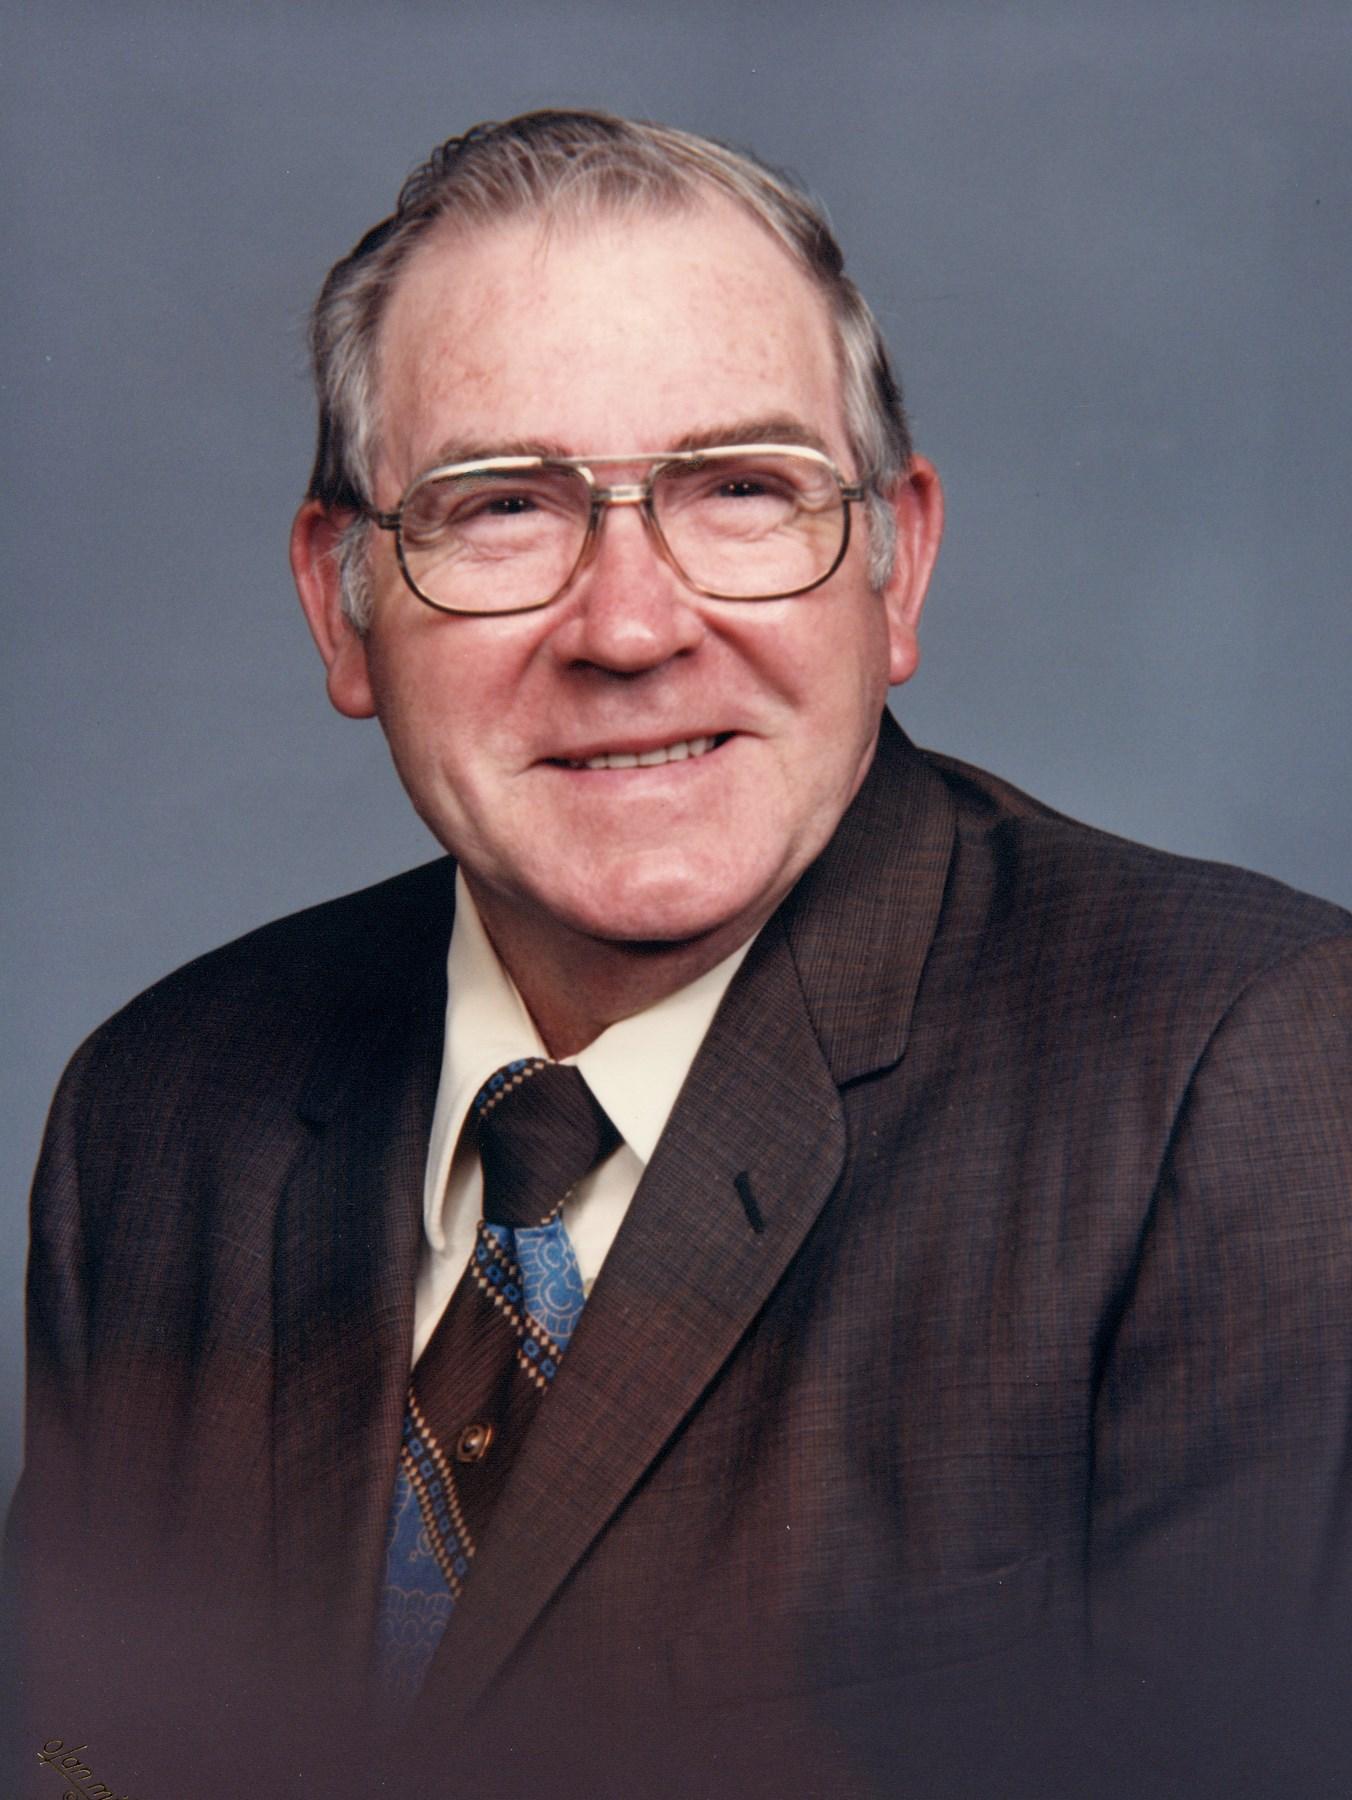 CECIL L REESE Obituary - Wilmington, NC